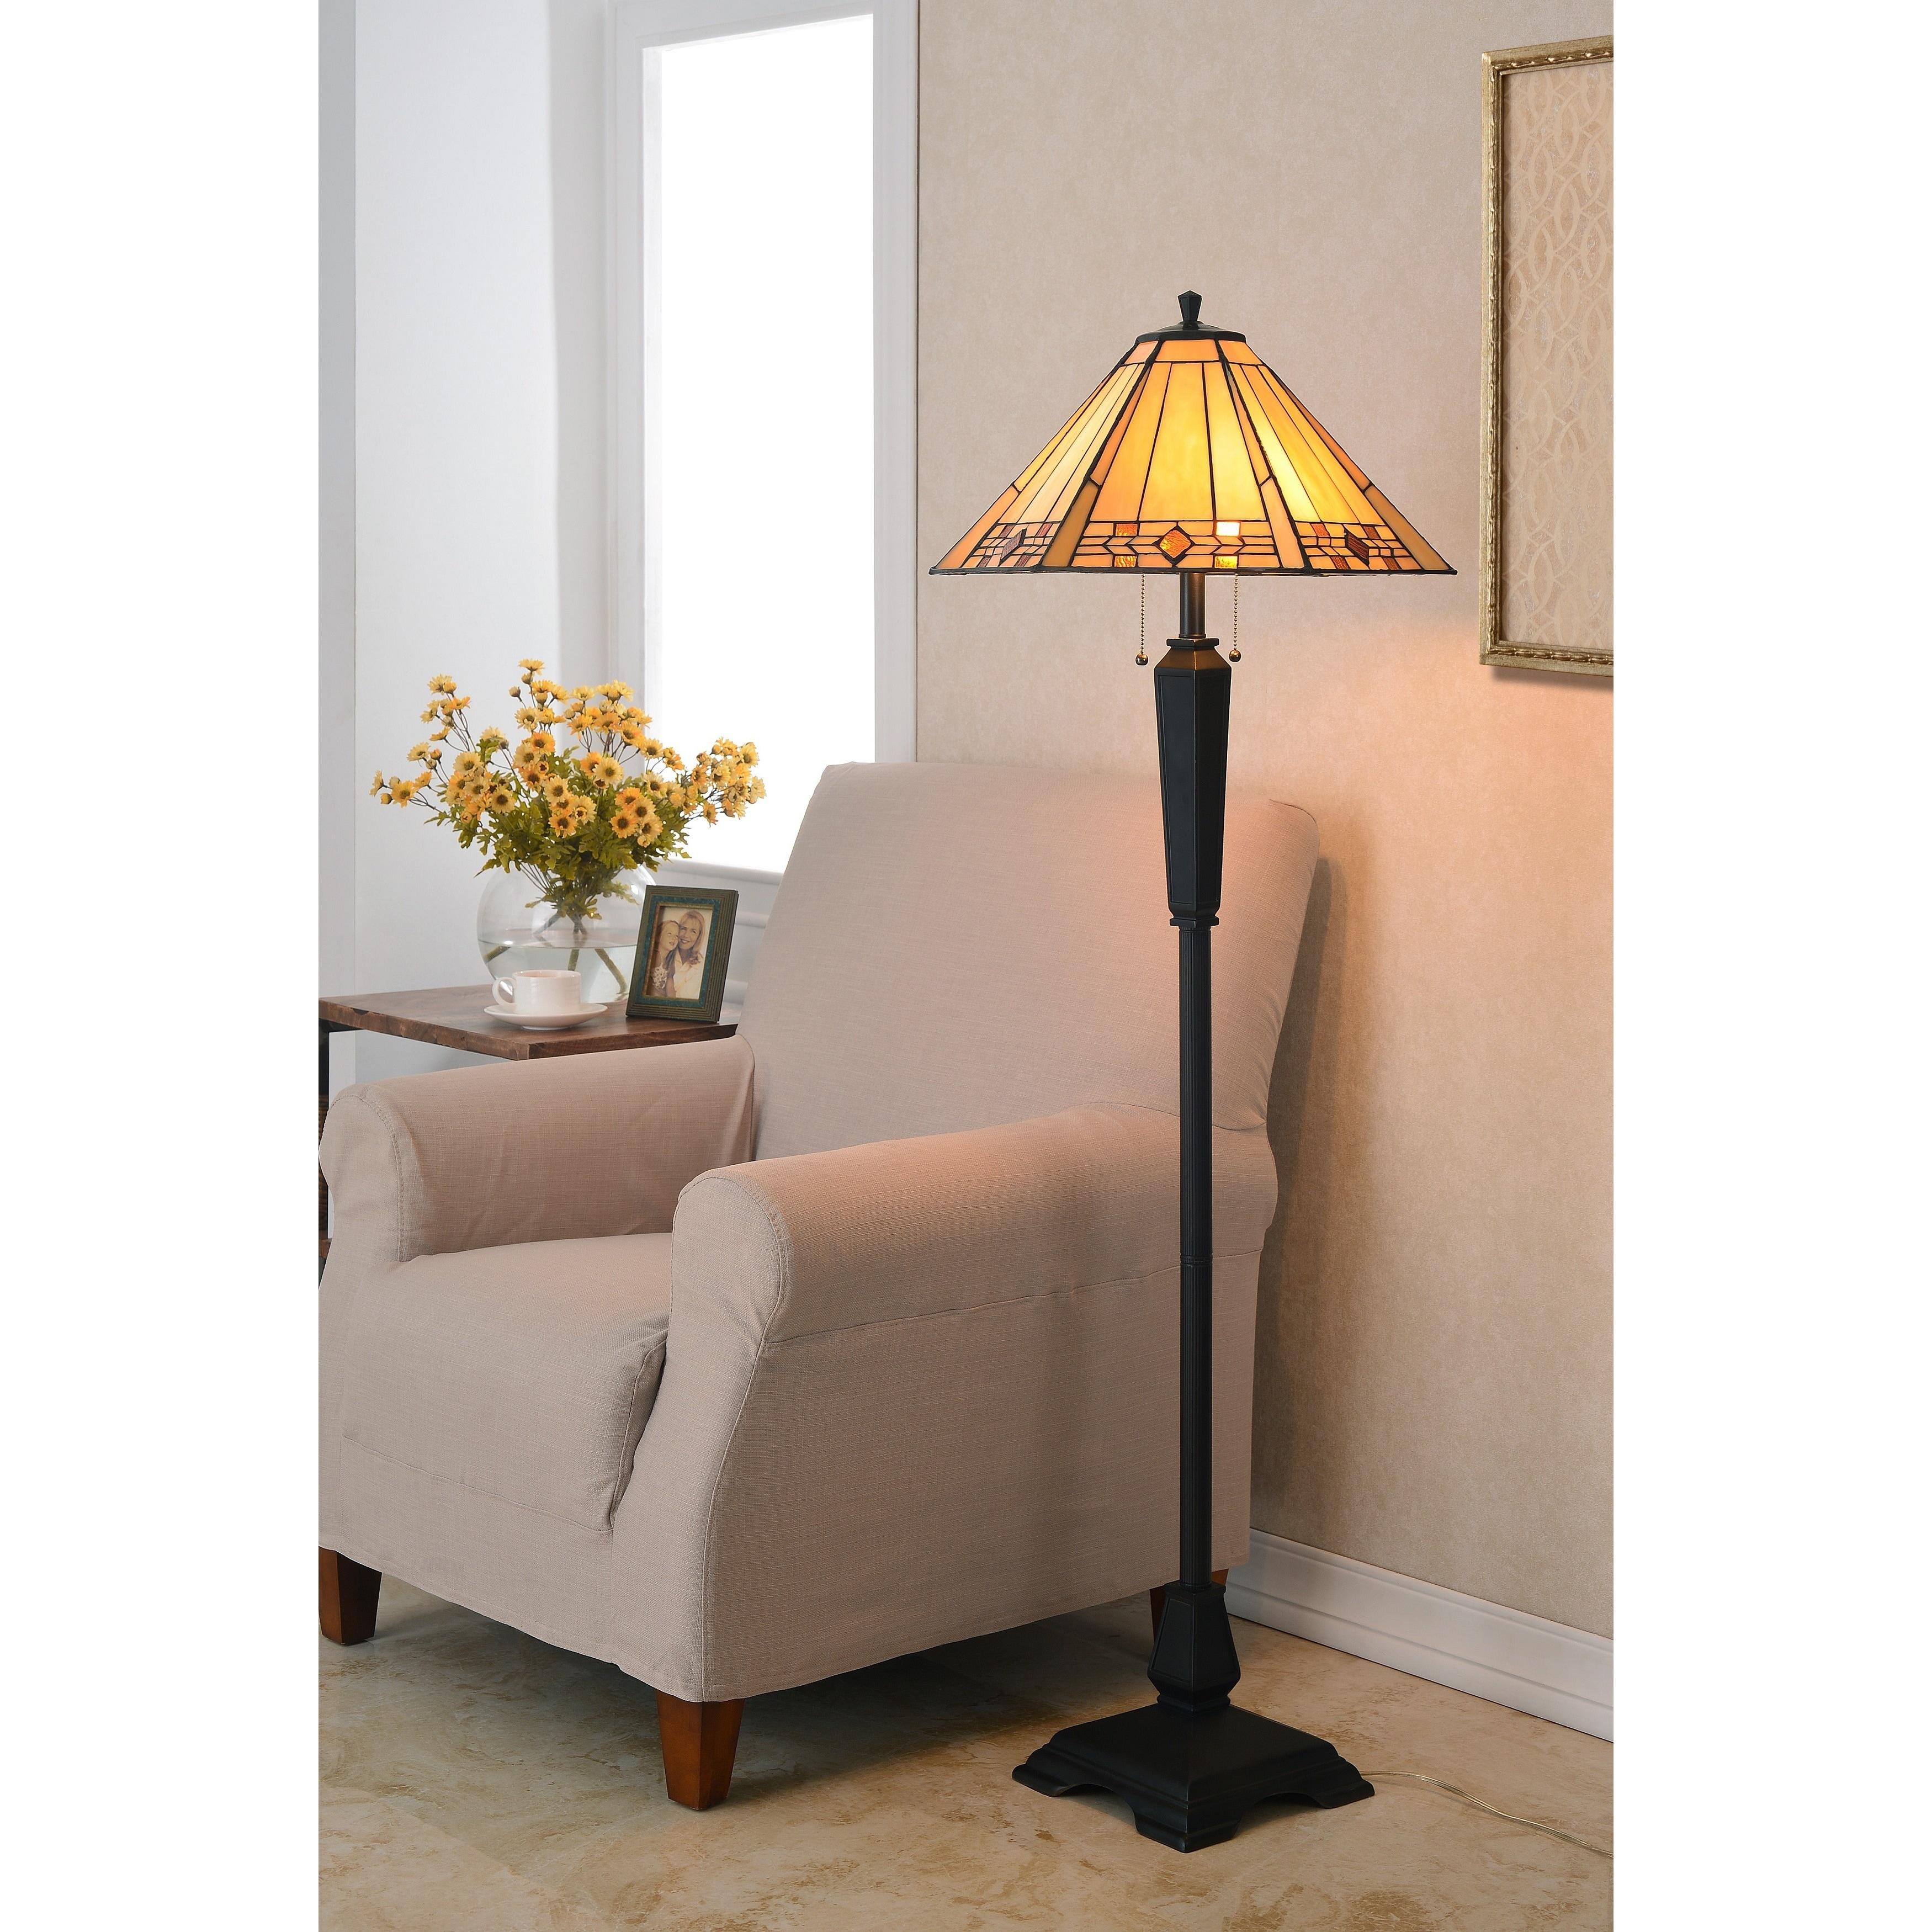 Amazing Gracewood Hollow Godo 59 Inch Bronze Finish Floor Lamp Theyellowbook Wood Chair Design Ideas Theyellowbookinfo